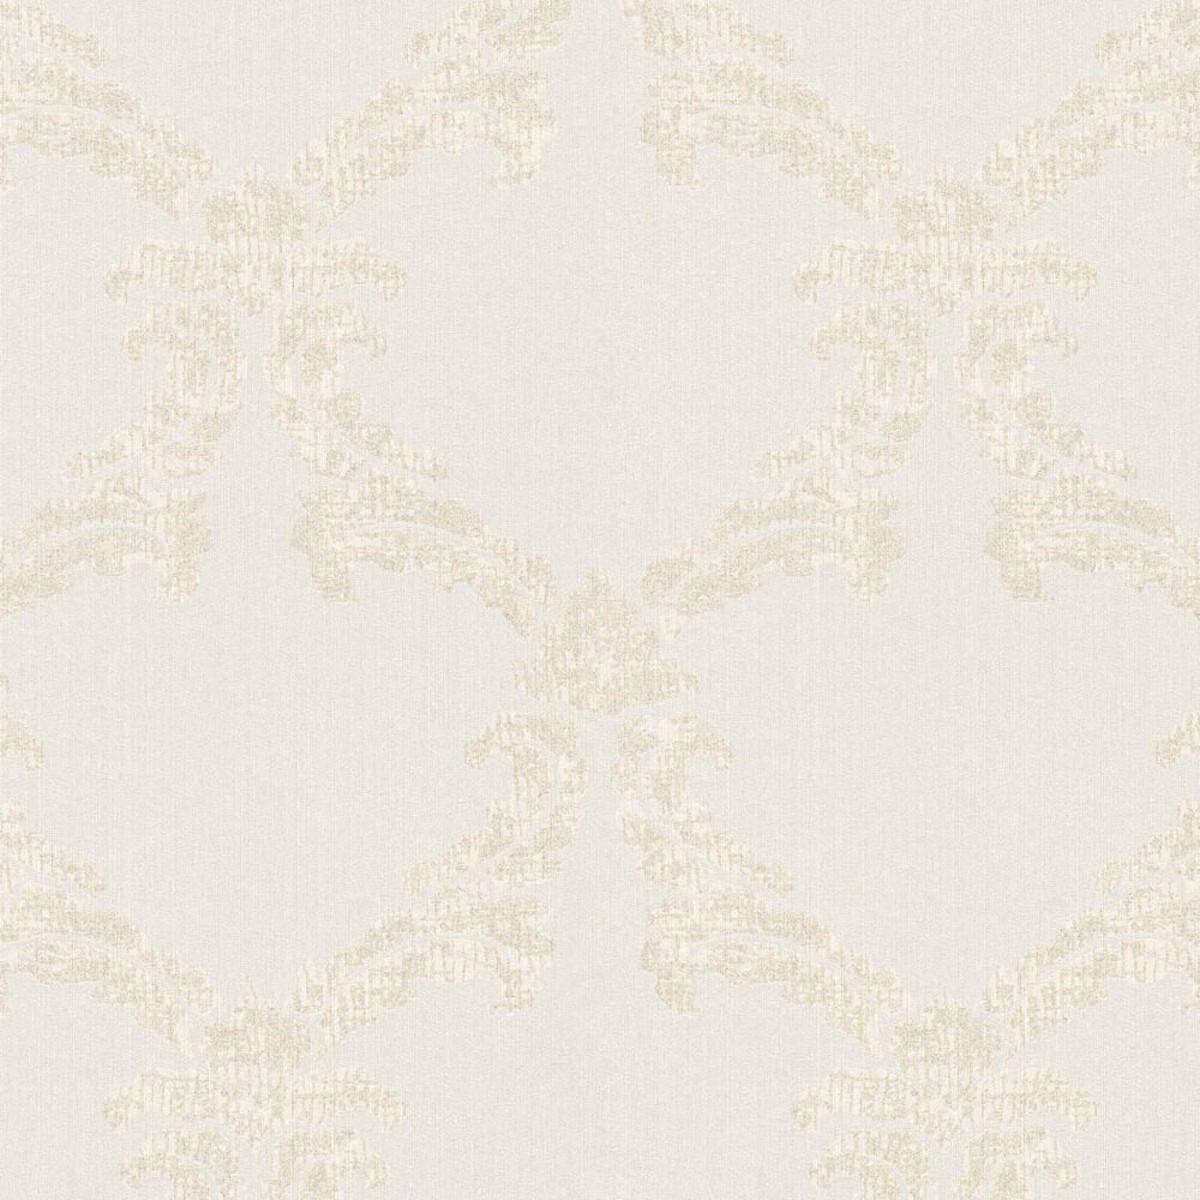 Обои текстильные Architects Paper Haute Couture3 бежевые 0.53 м 2904-10